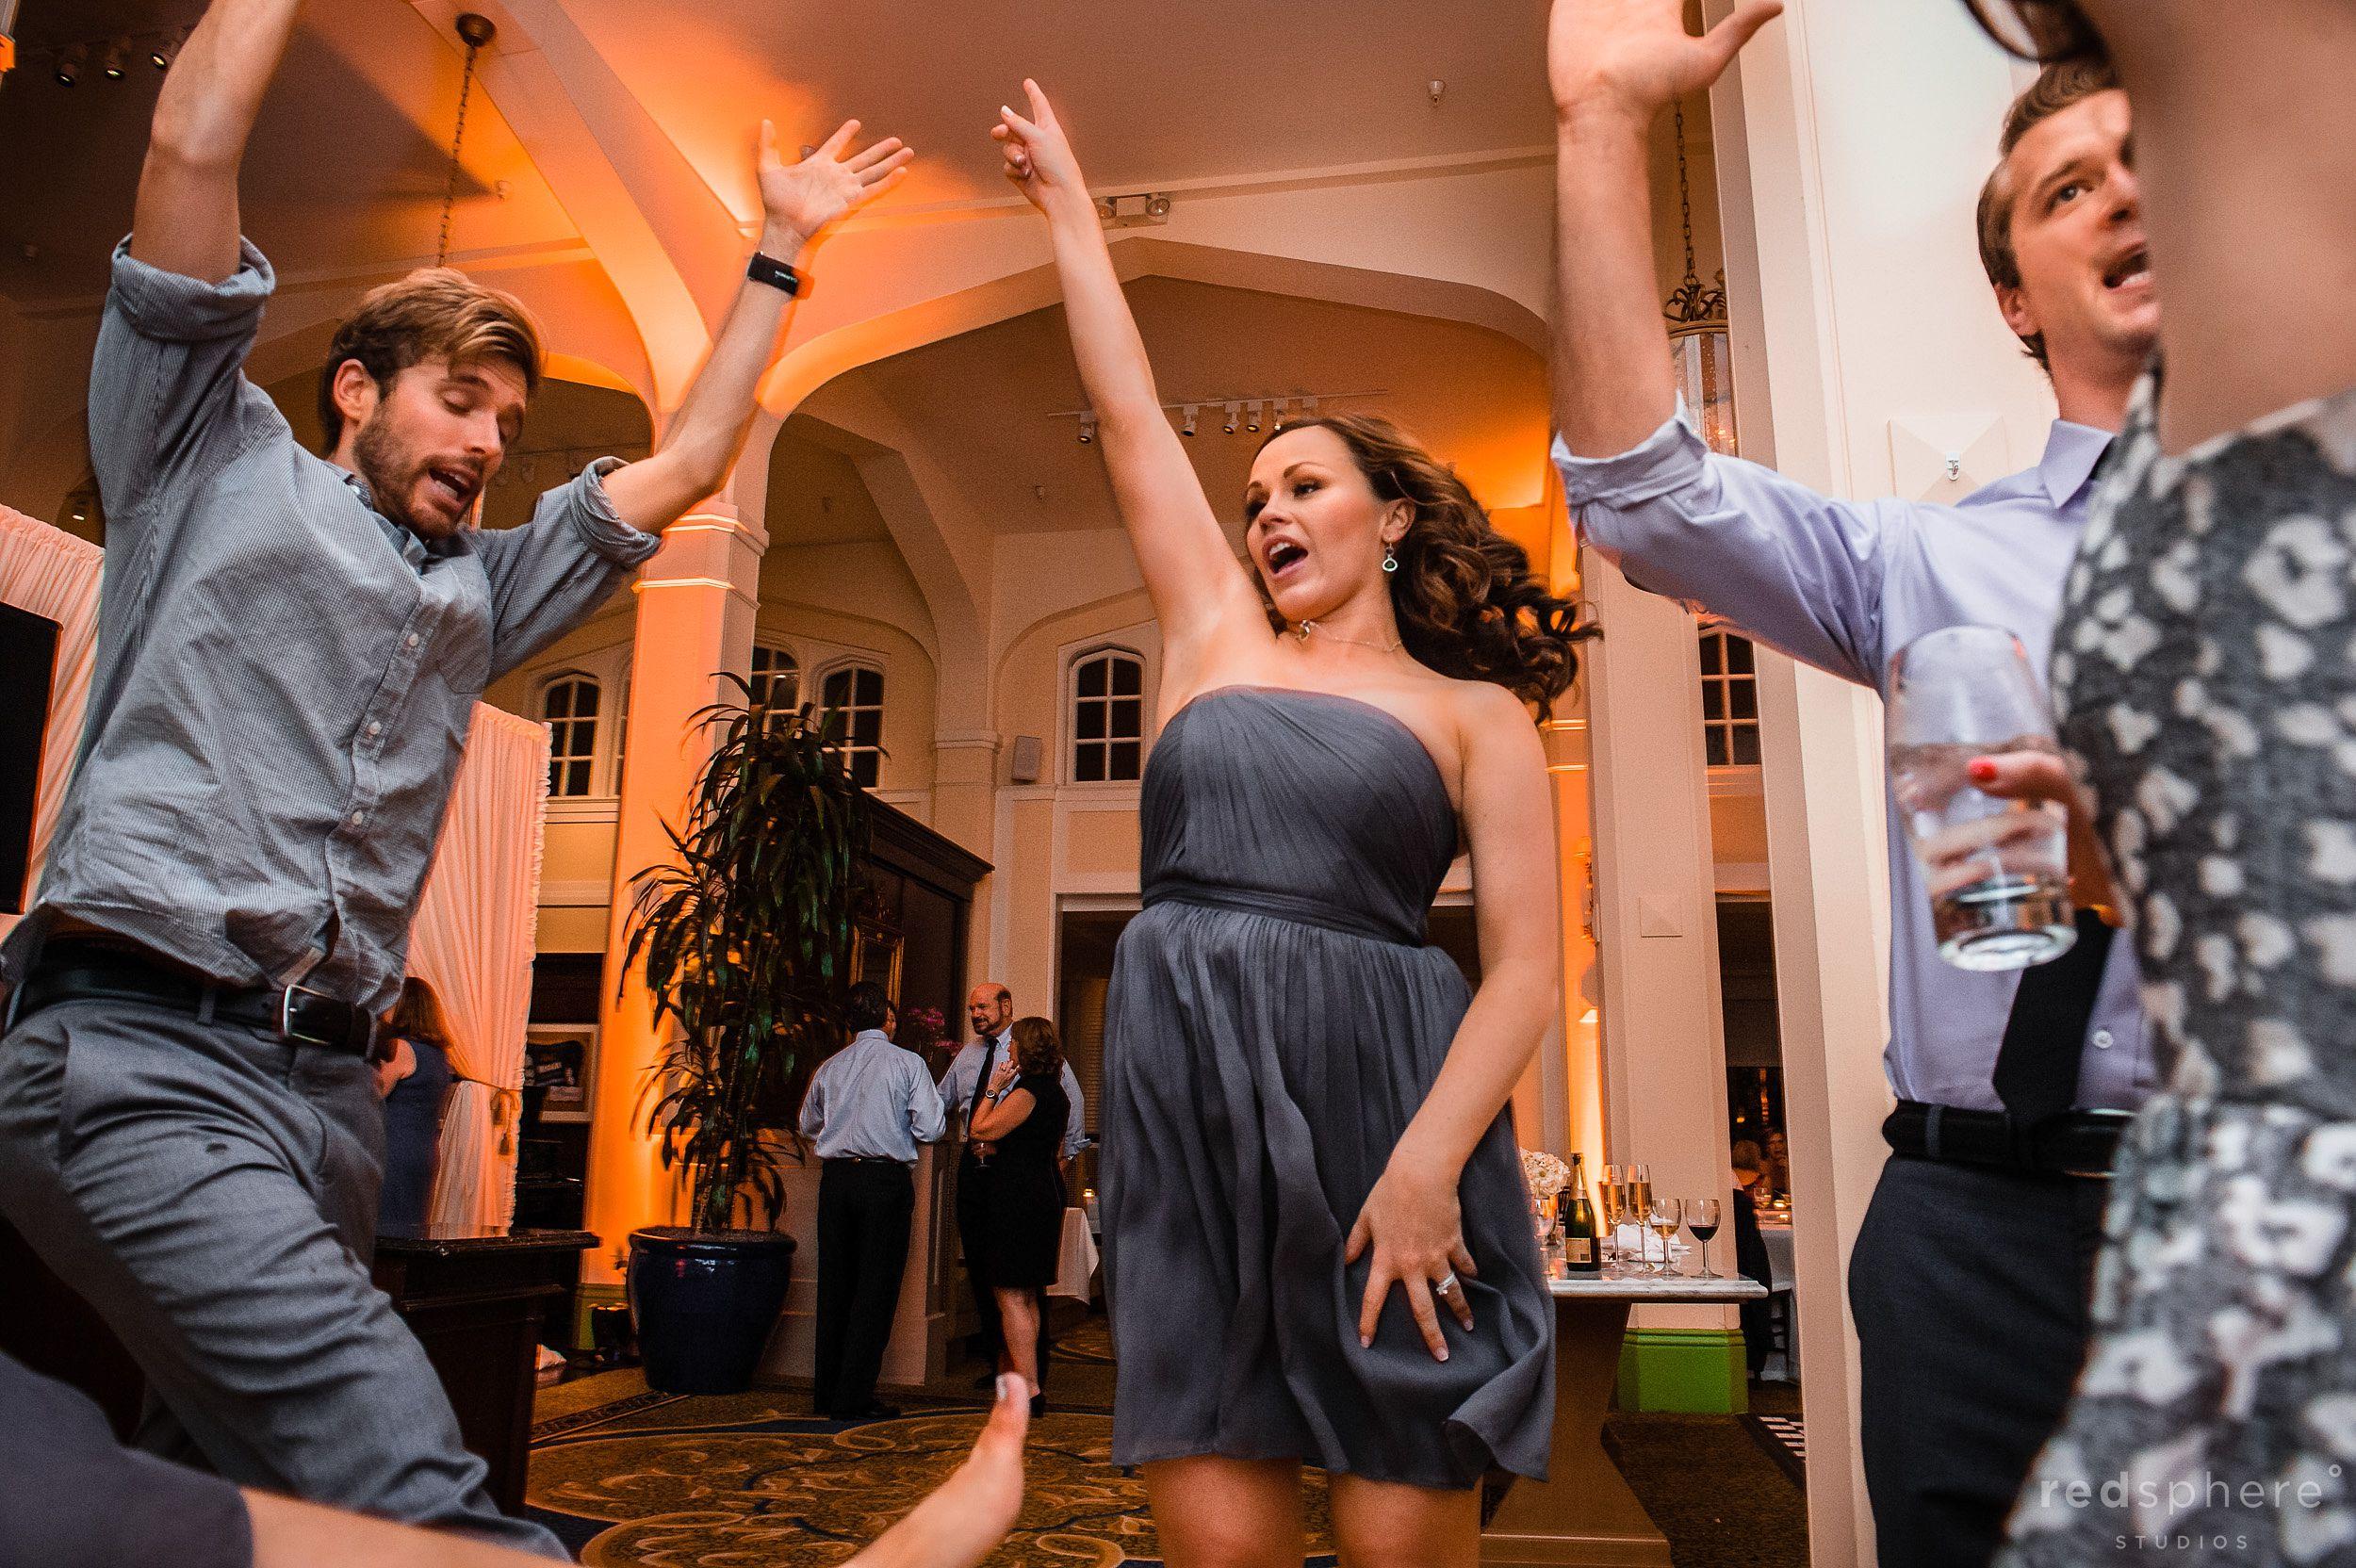 Guests Jump Dancing at Wedding Reception, Berkeley California